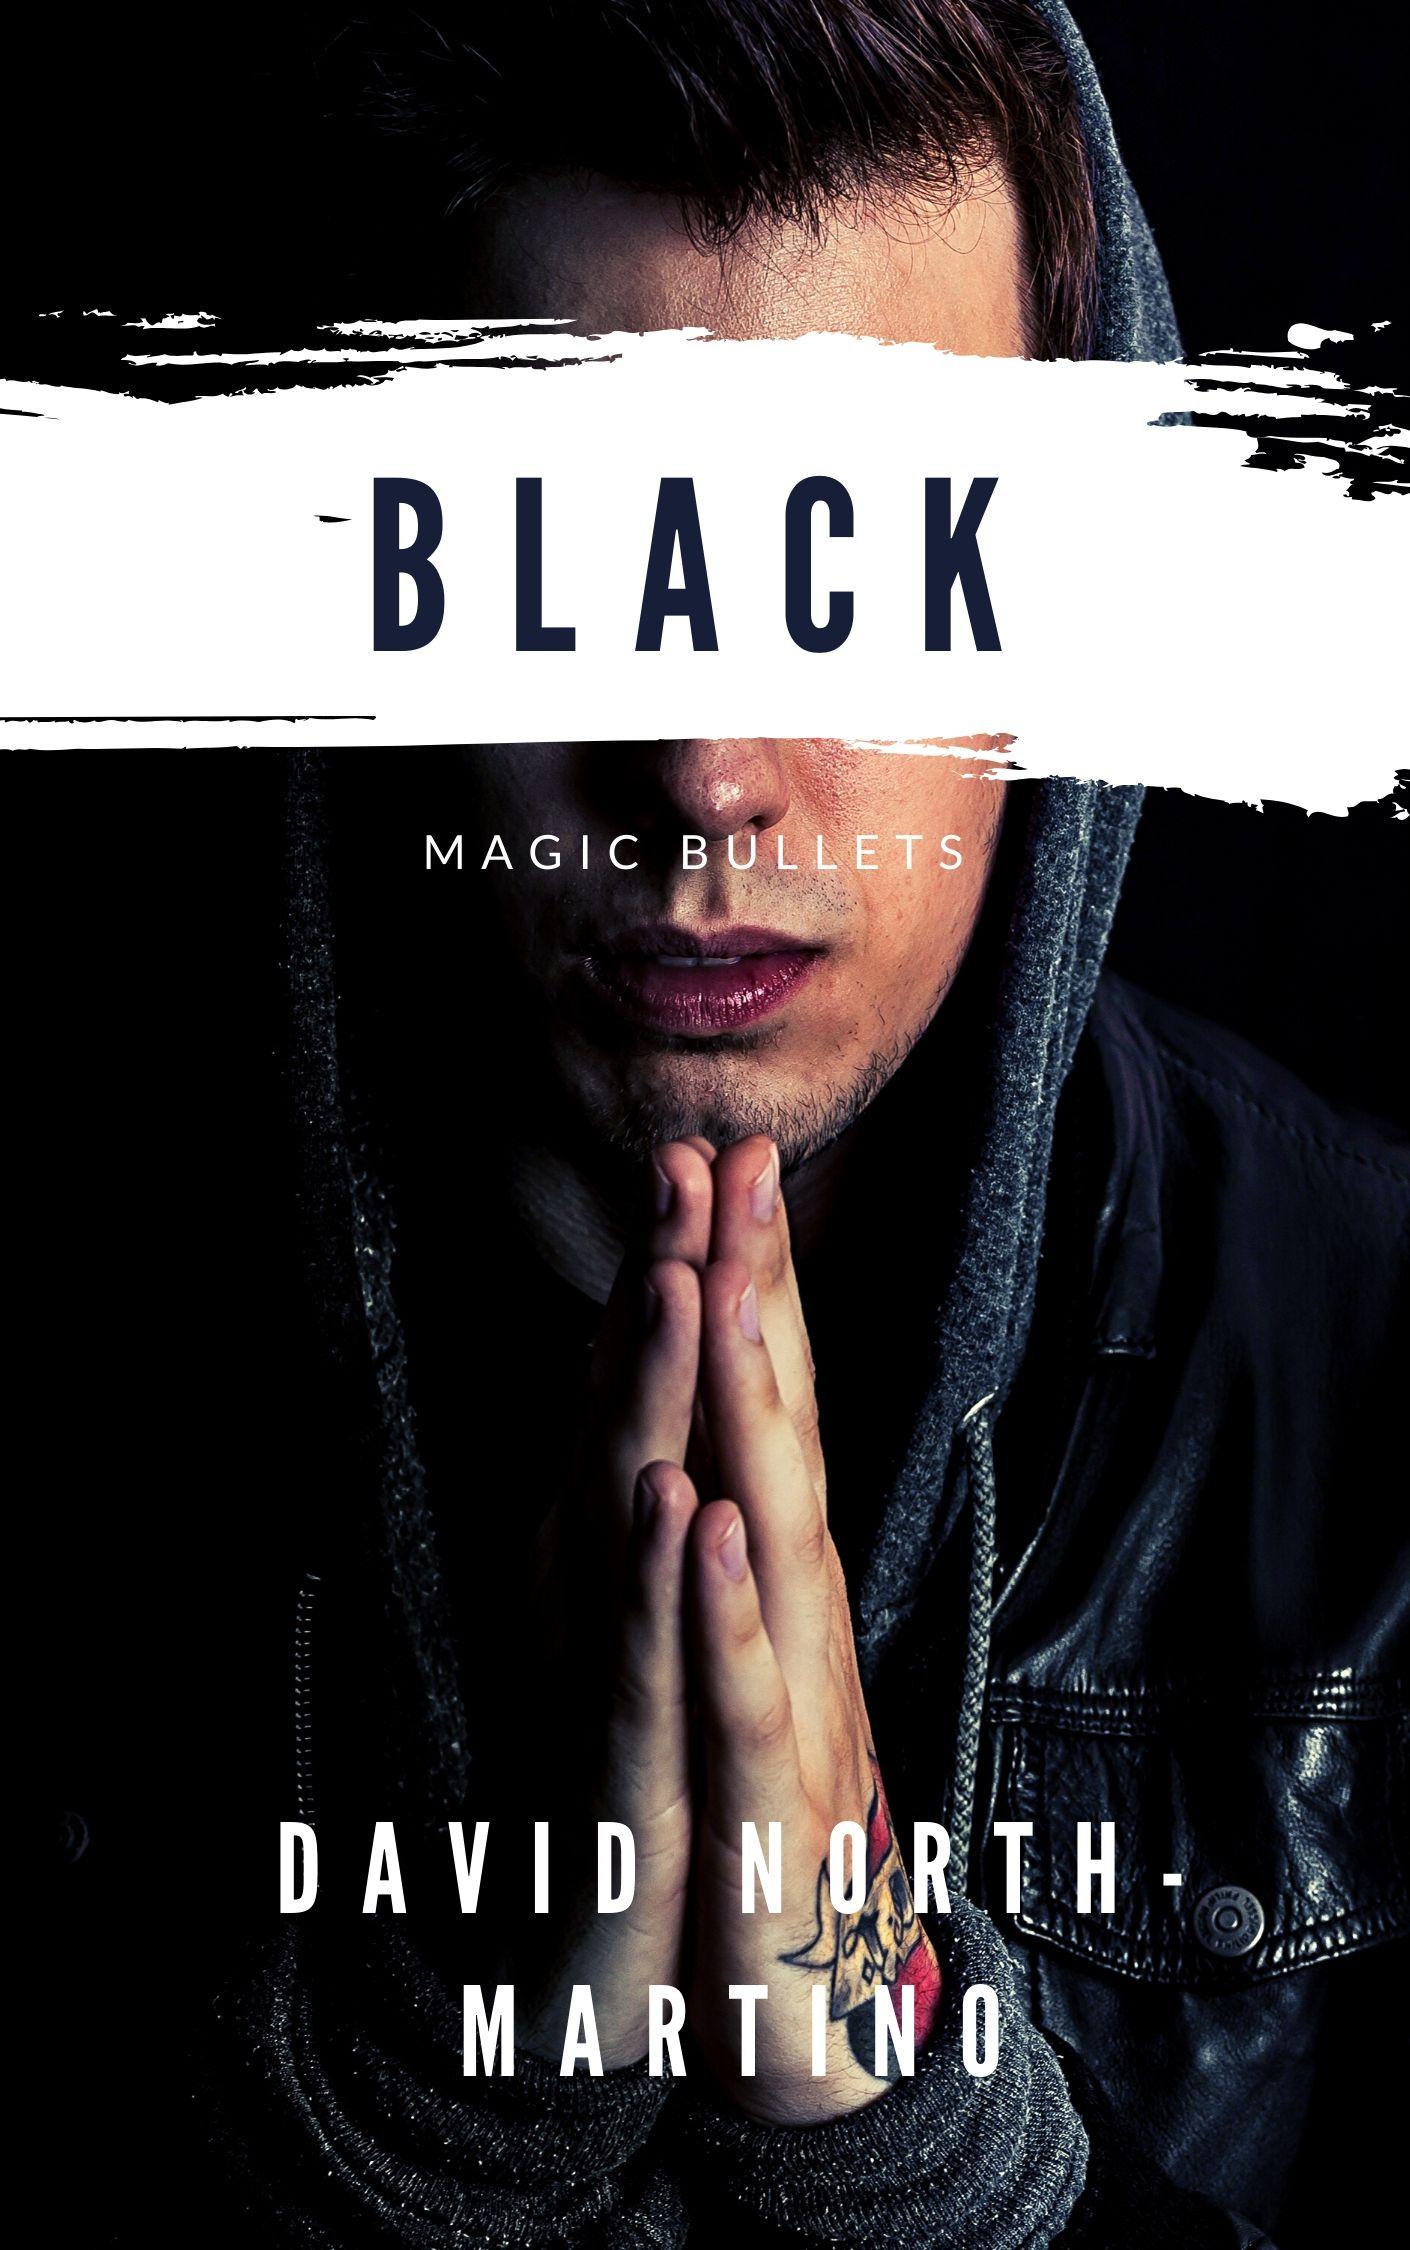 Black Magic Bullets